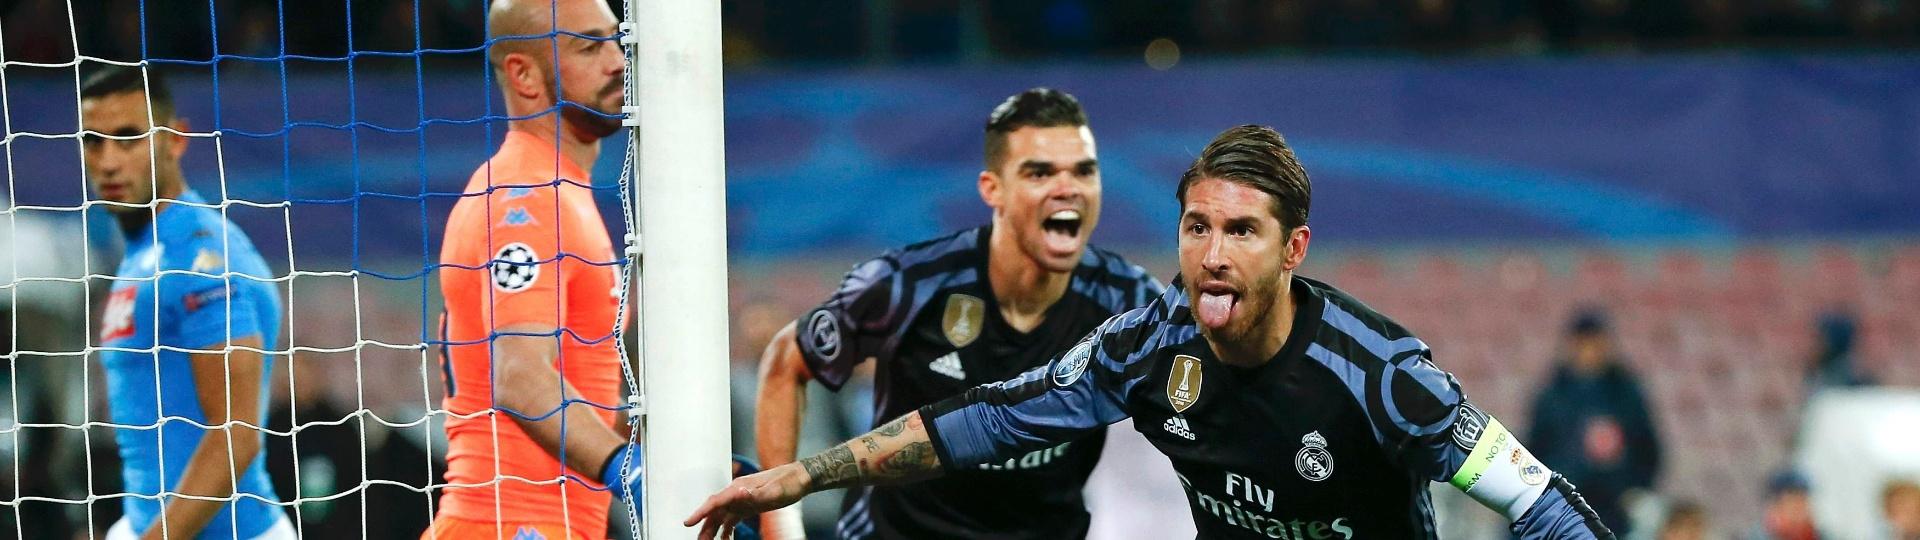 Sergio Ramos comemora gol marcado para o Real Madrid contra o Napoli